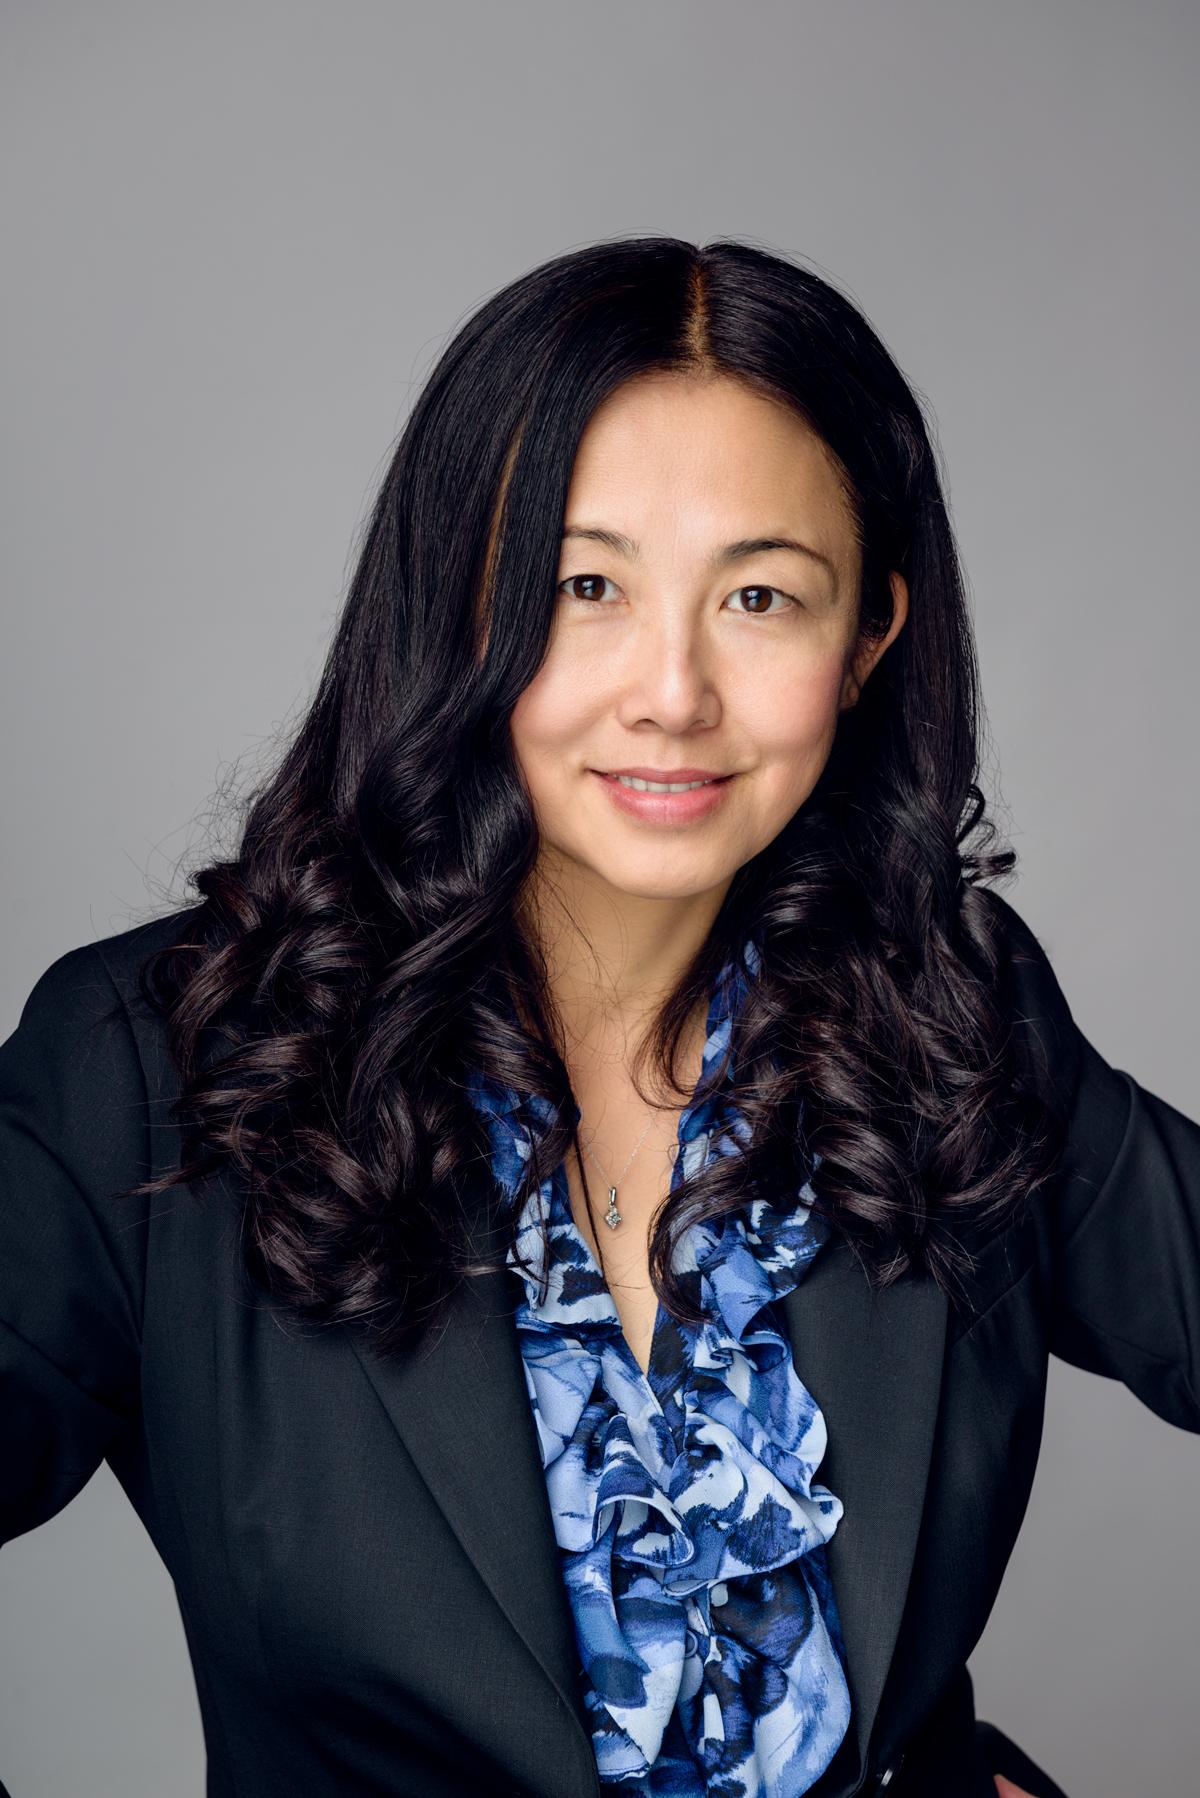 Jean - Professional Portrait - Mortgage Specialist - TD Canada